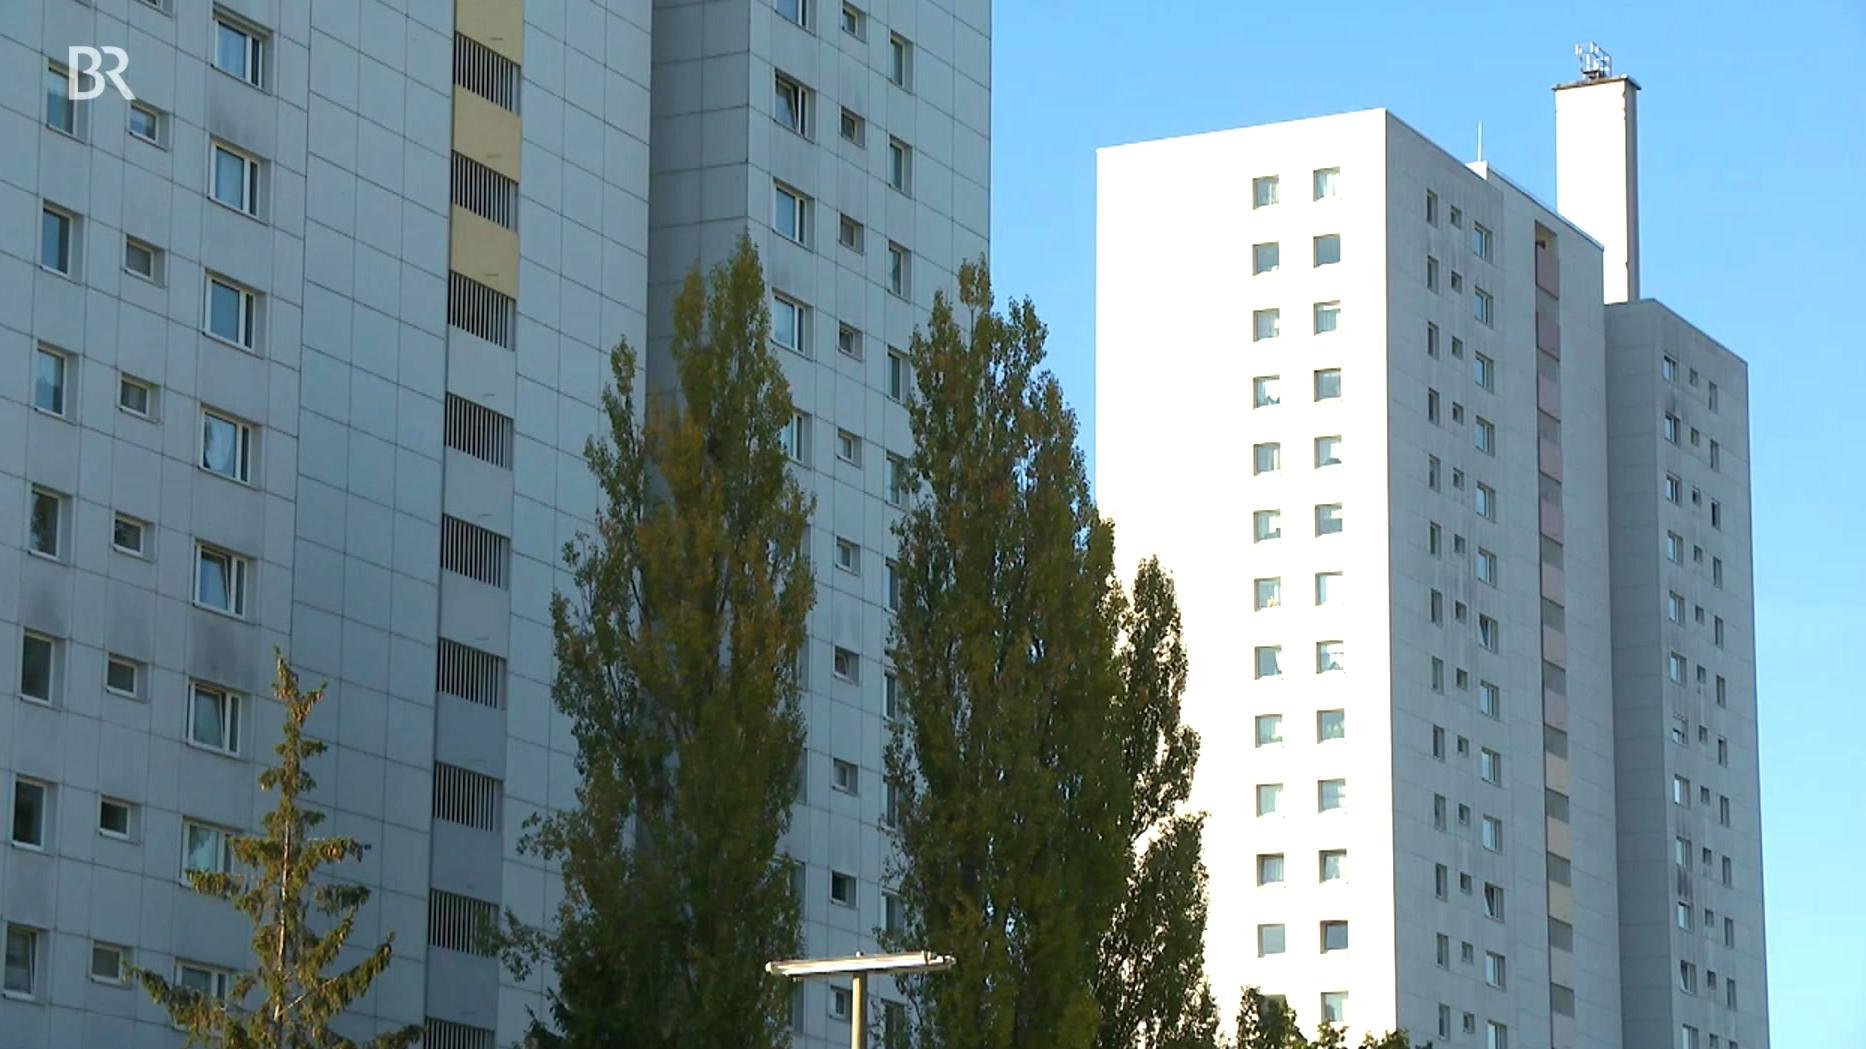 Zwei Hochhäuser in Nürnberg